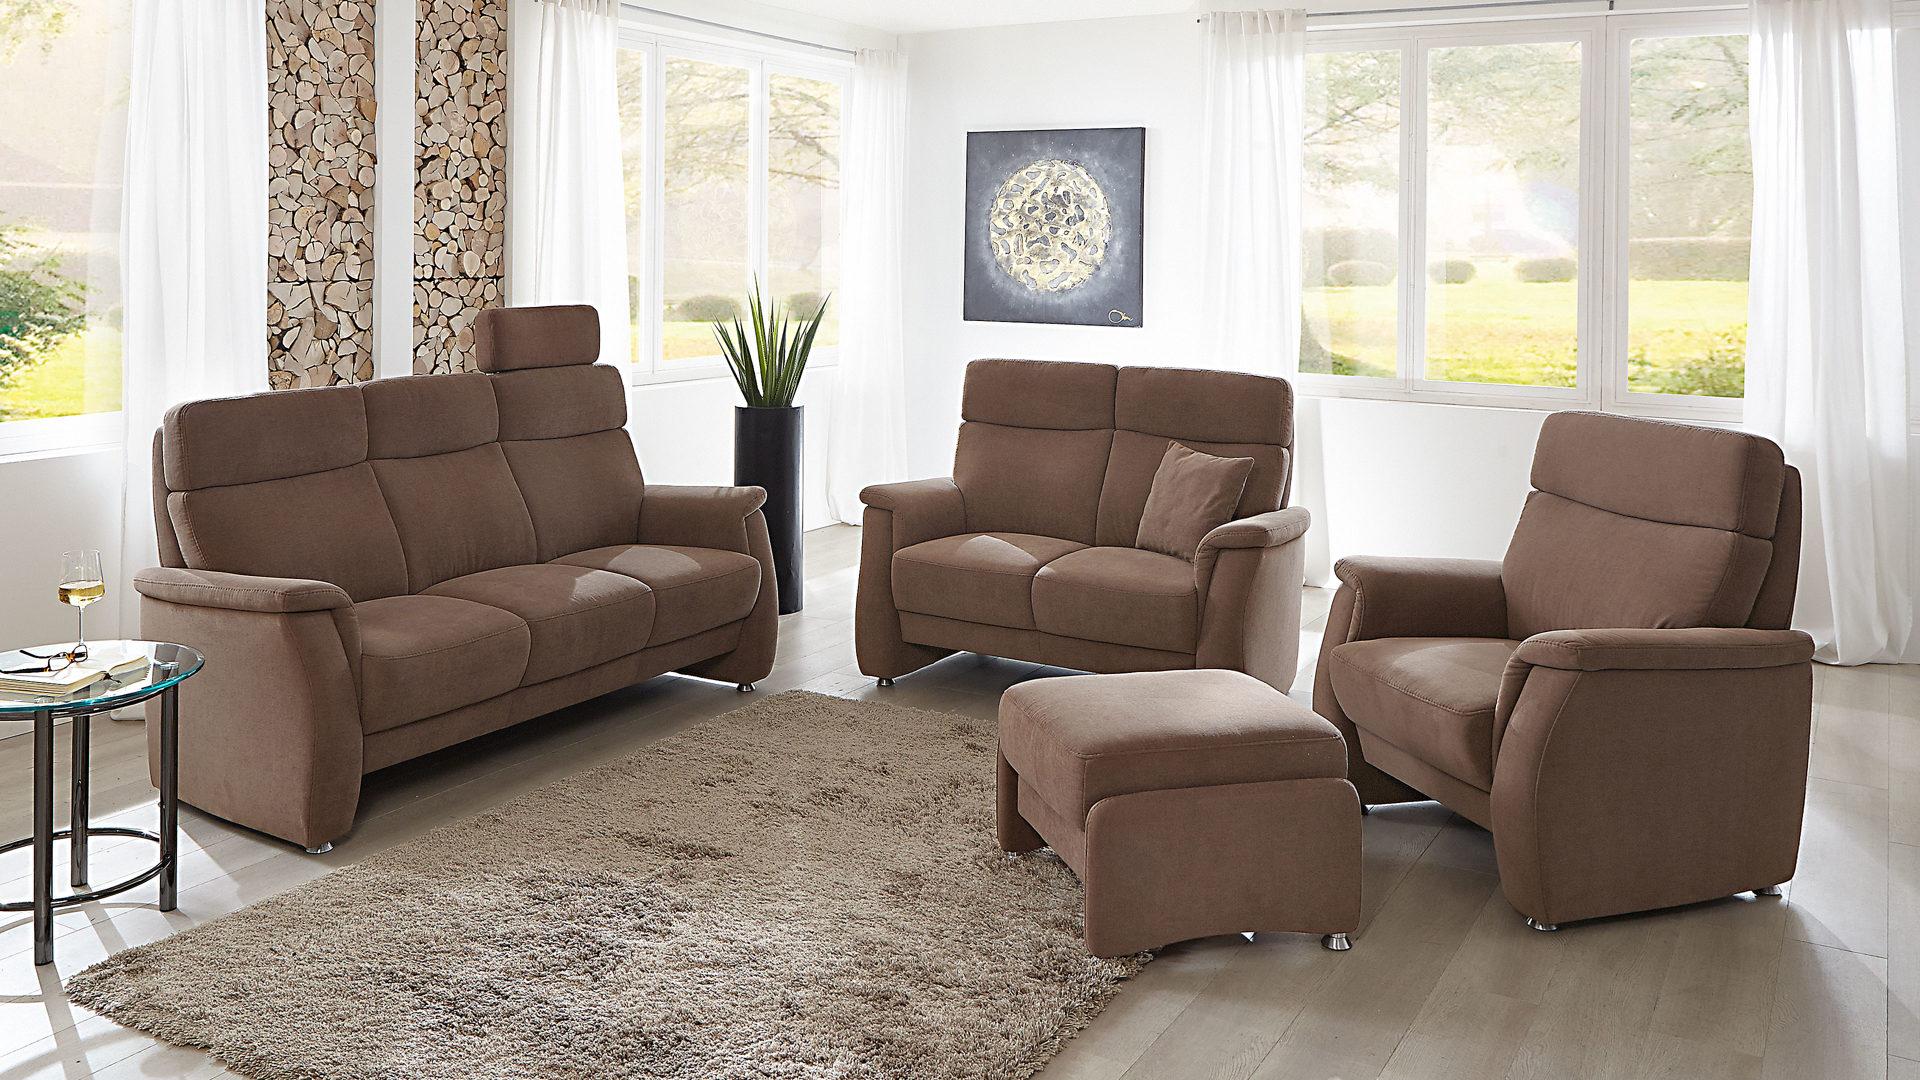 Sofa 3 Sitzer Gnstig. Sofa Sitzer Gnstig Savae Org Garnitur With ...